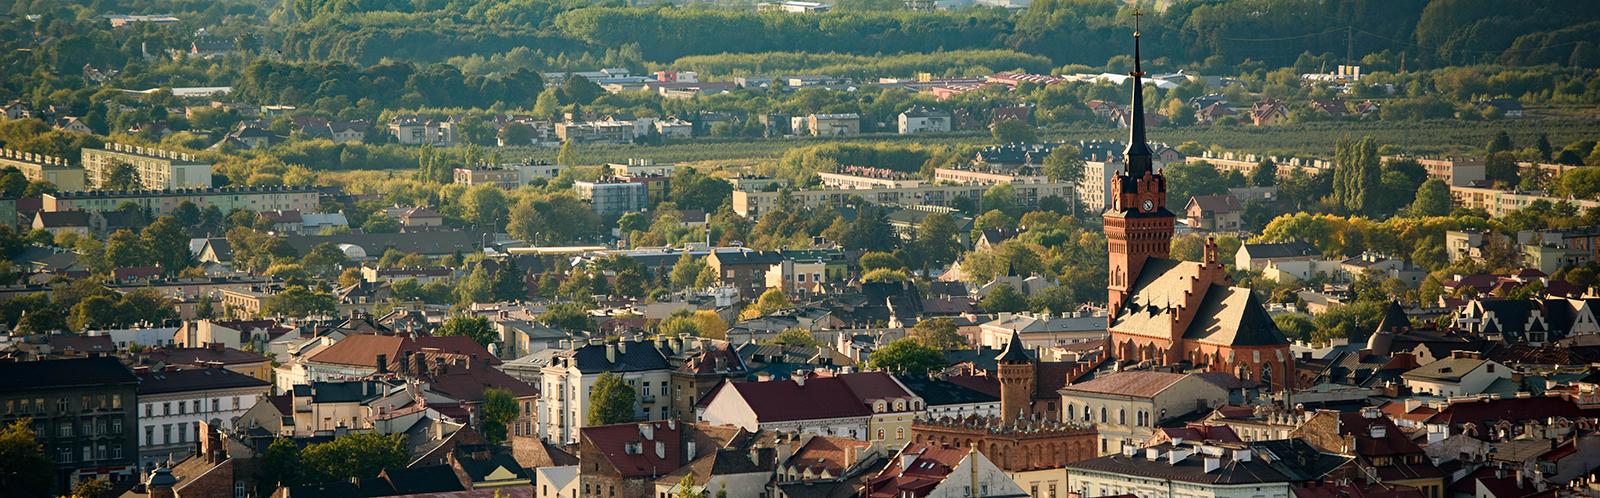 Tarnow agglomeration